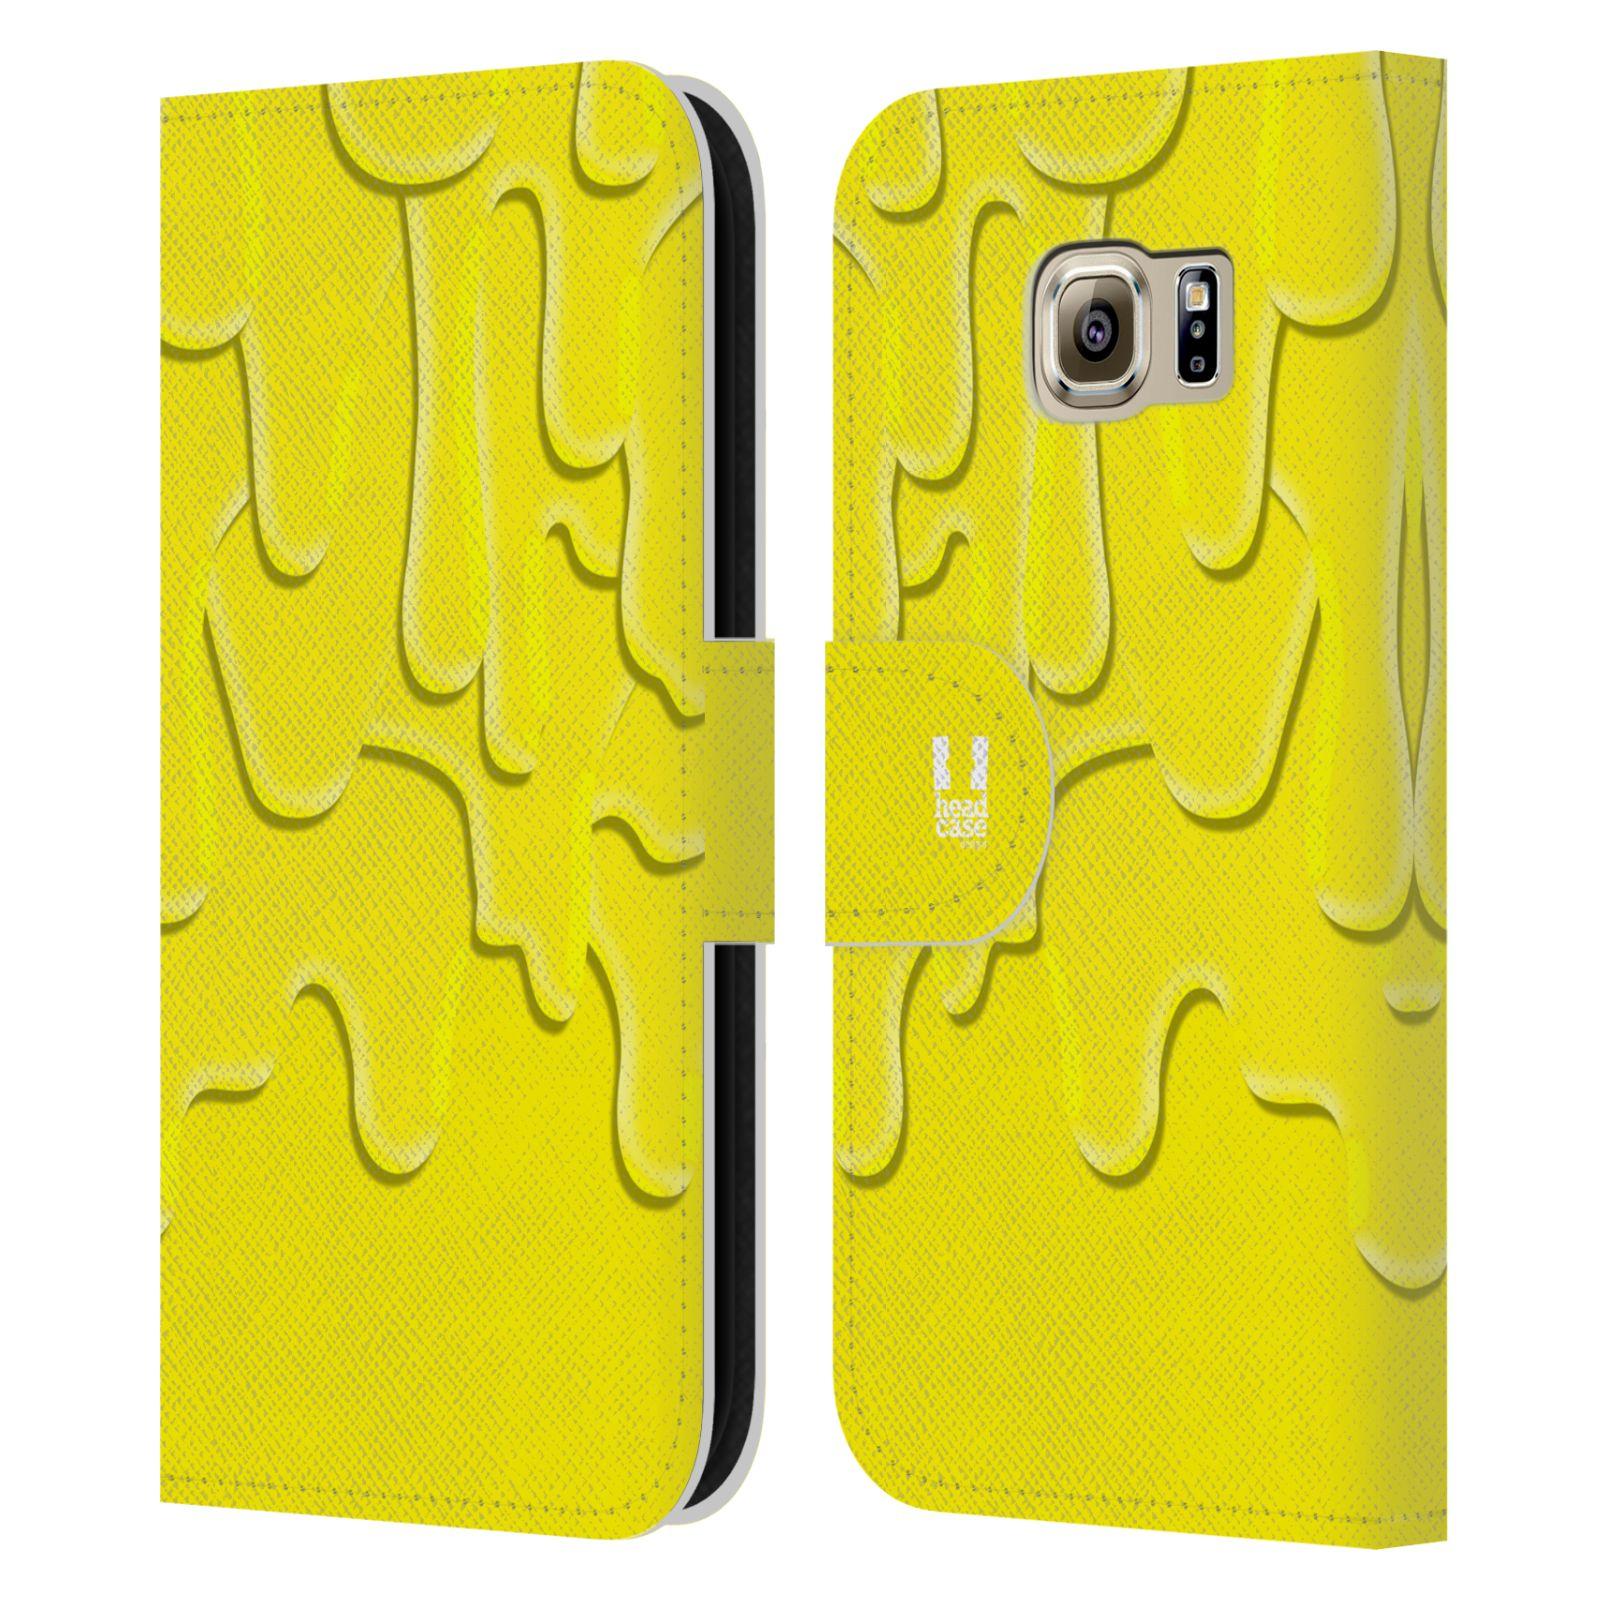 HEAD CASE Flipové pouzdro pro mobil Samsung Galaxy S6 (G9200) ZÁPLAVA BARVA žlutá